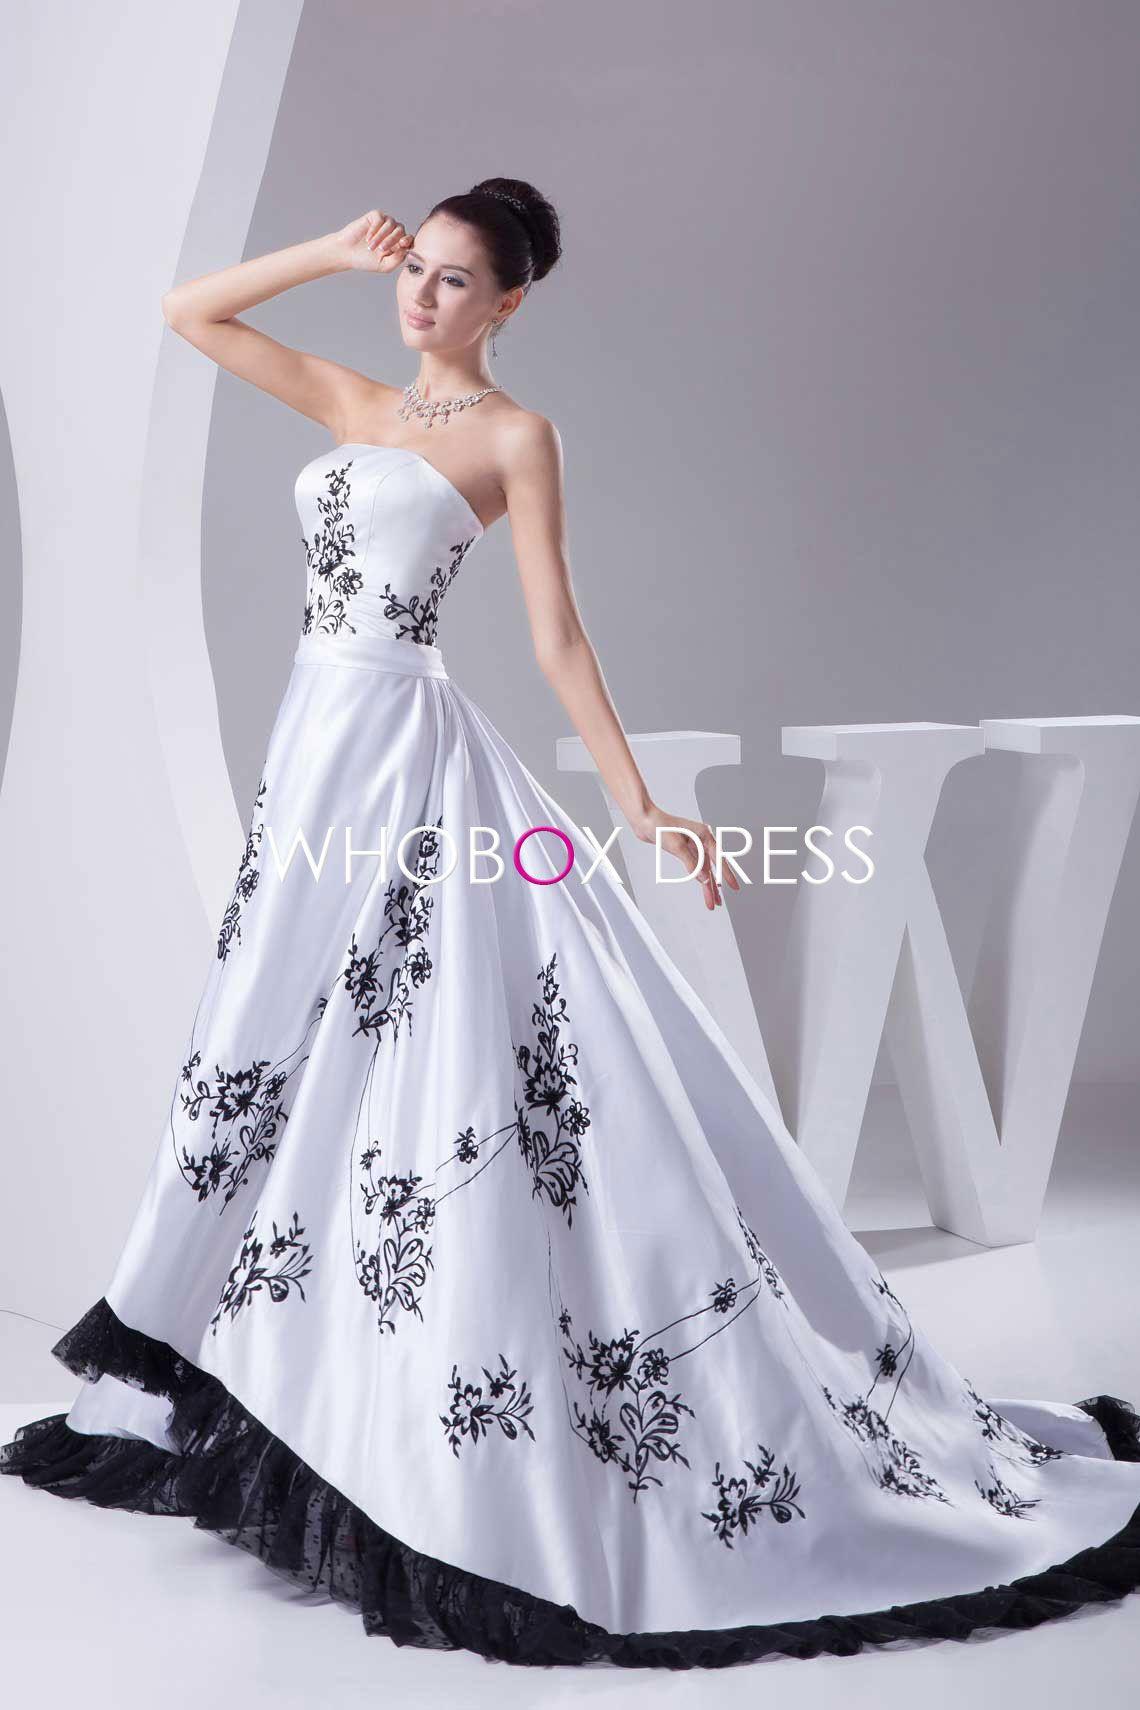 Wedding Dress Wedding Dresses Wedding Dresses White Wedding Dresses Halloween Wedding Dresses [ 1710 x 1140 Pixel ]